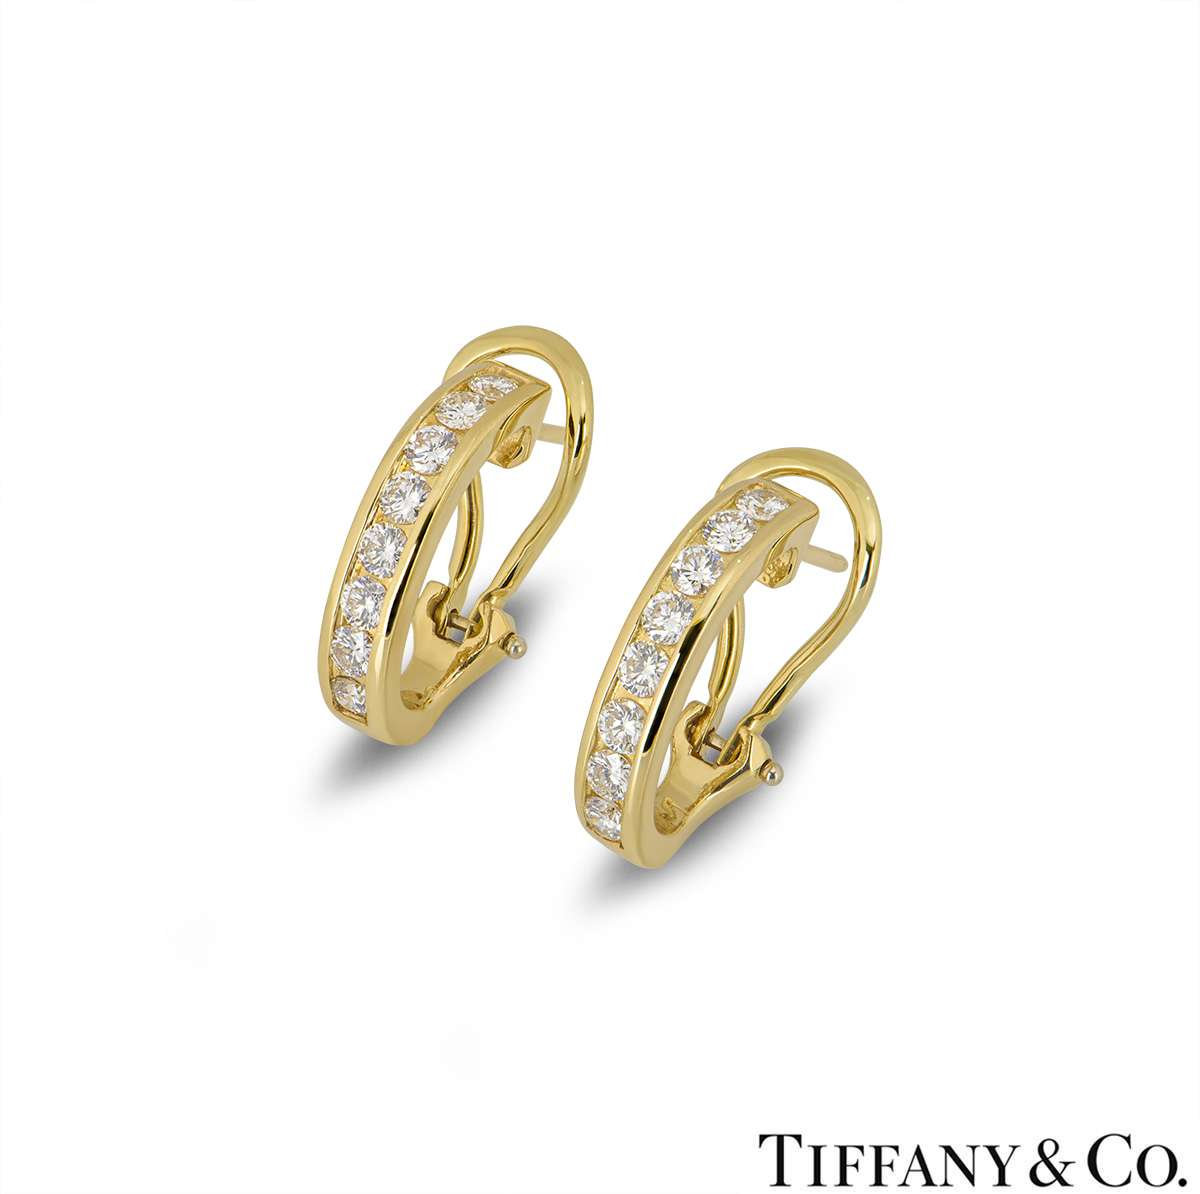 Tiffany & Co 18k Yellow Gold Diamond Set Hoop Earrings 0.96ct